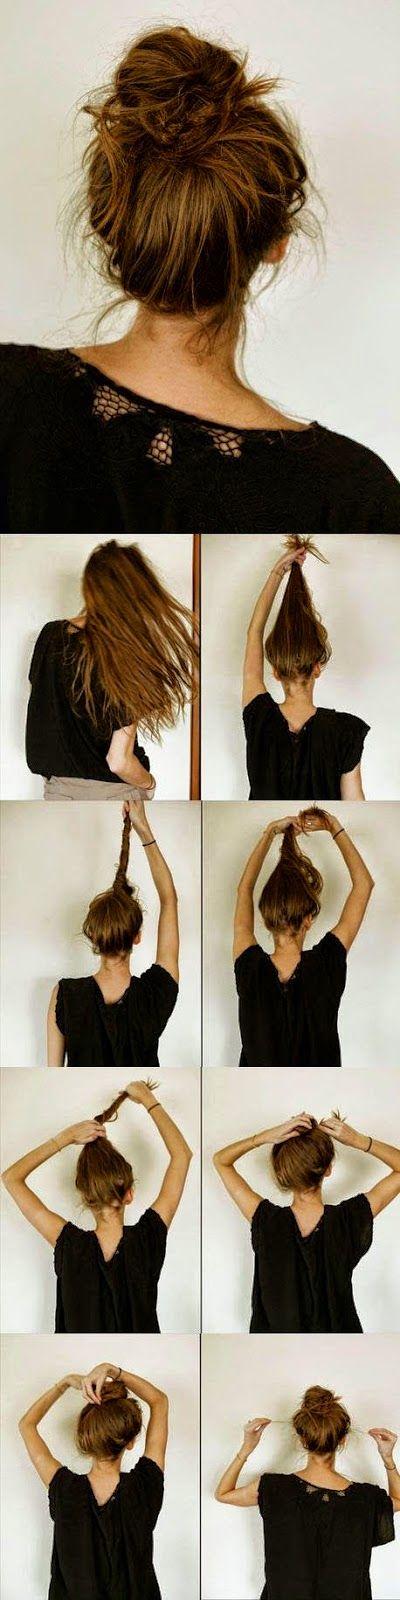 5 Trendy Low Bun Updo Hairstyles Tutorials Bun Hairstyles For Long Hair Cute Everyday Hairstyles Hair Styles